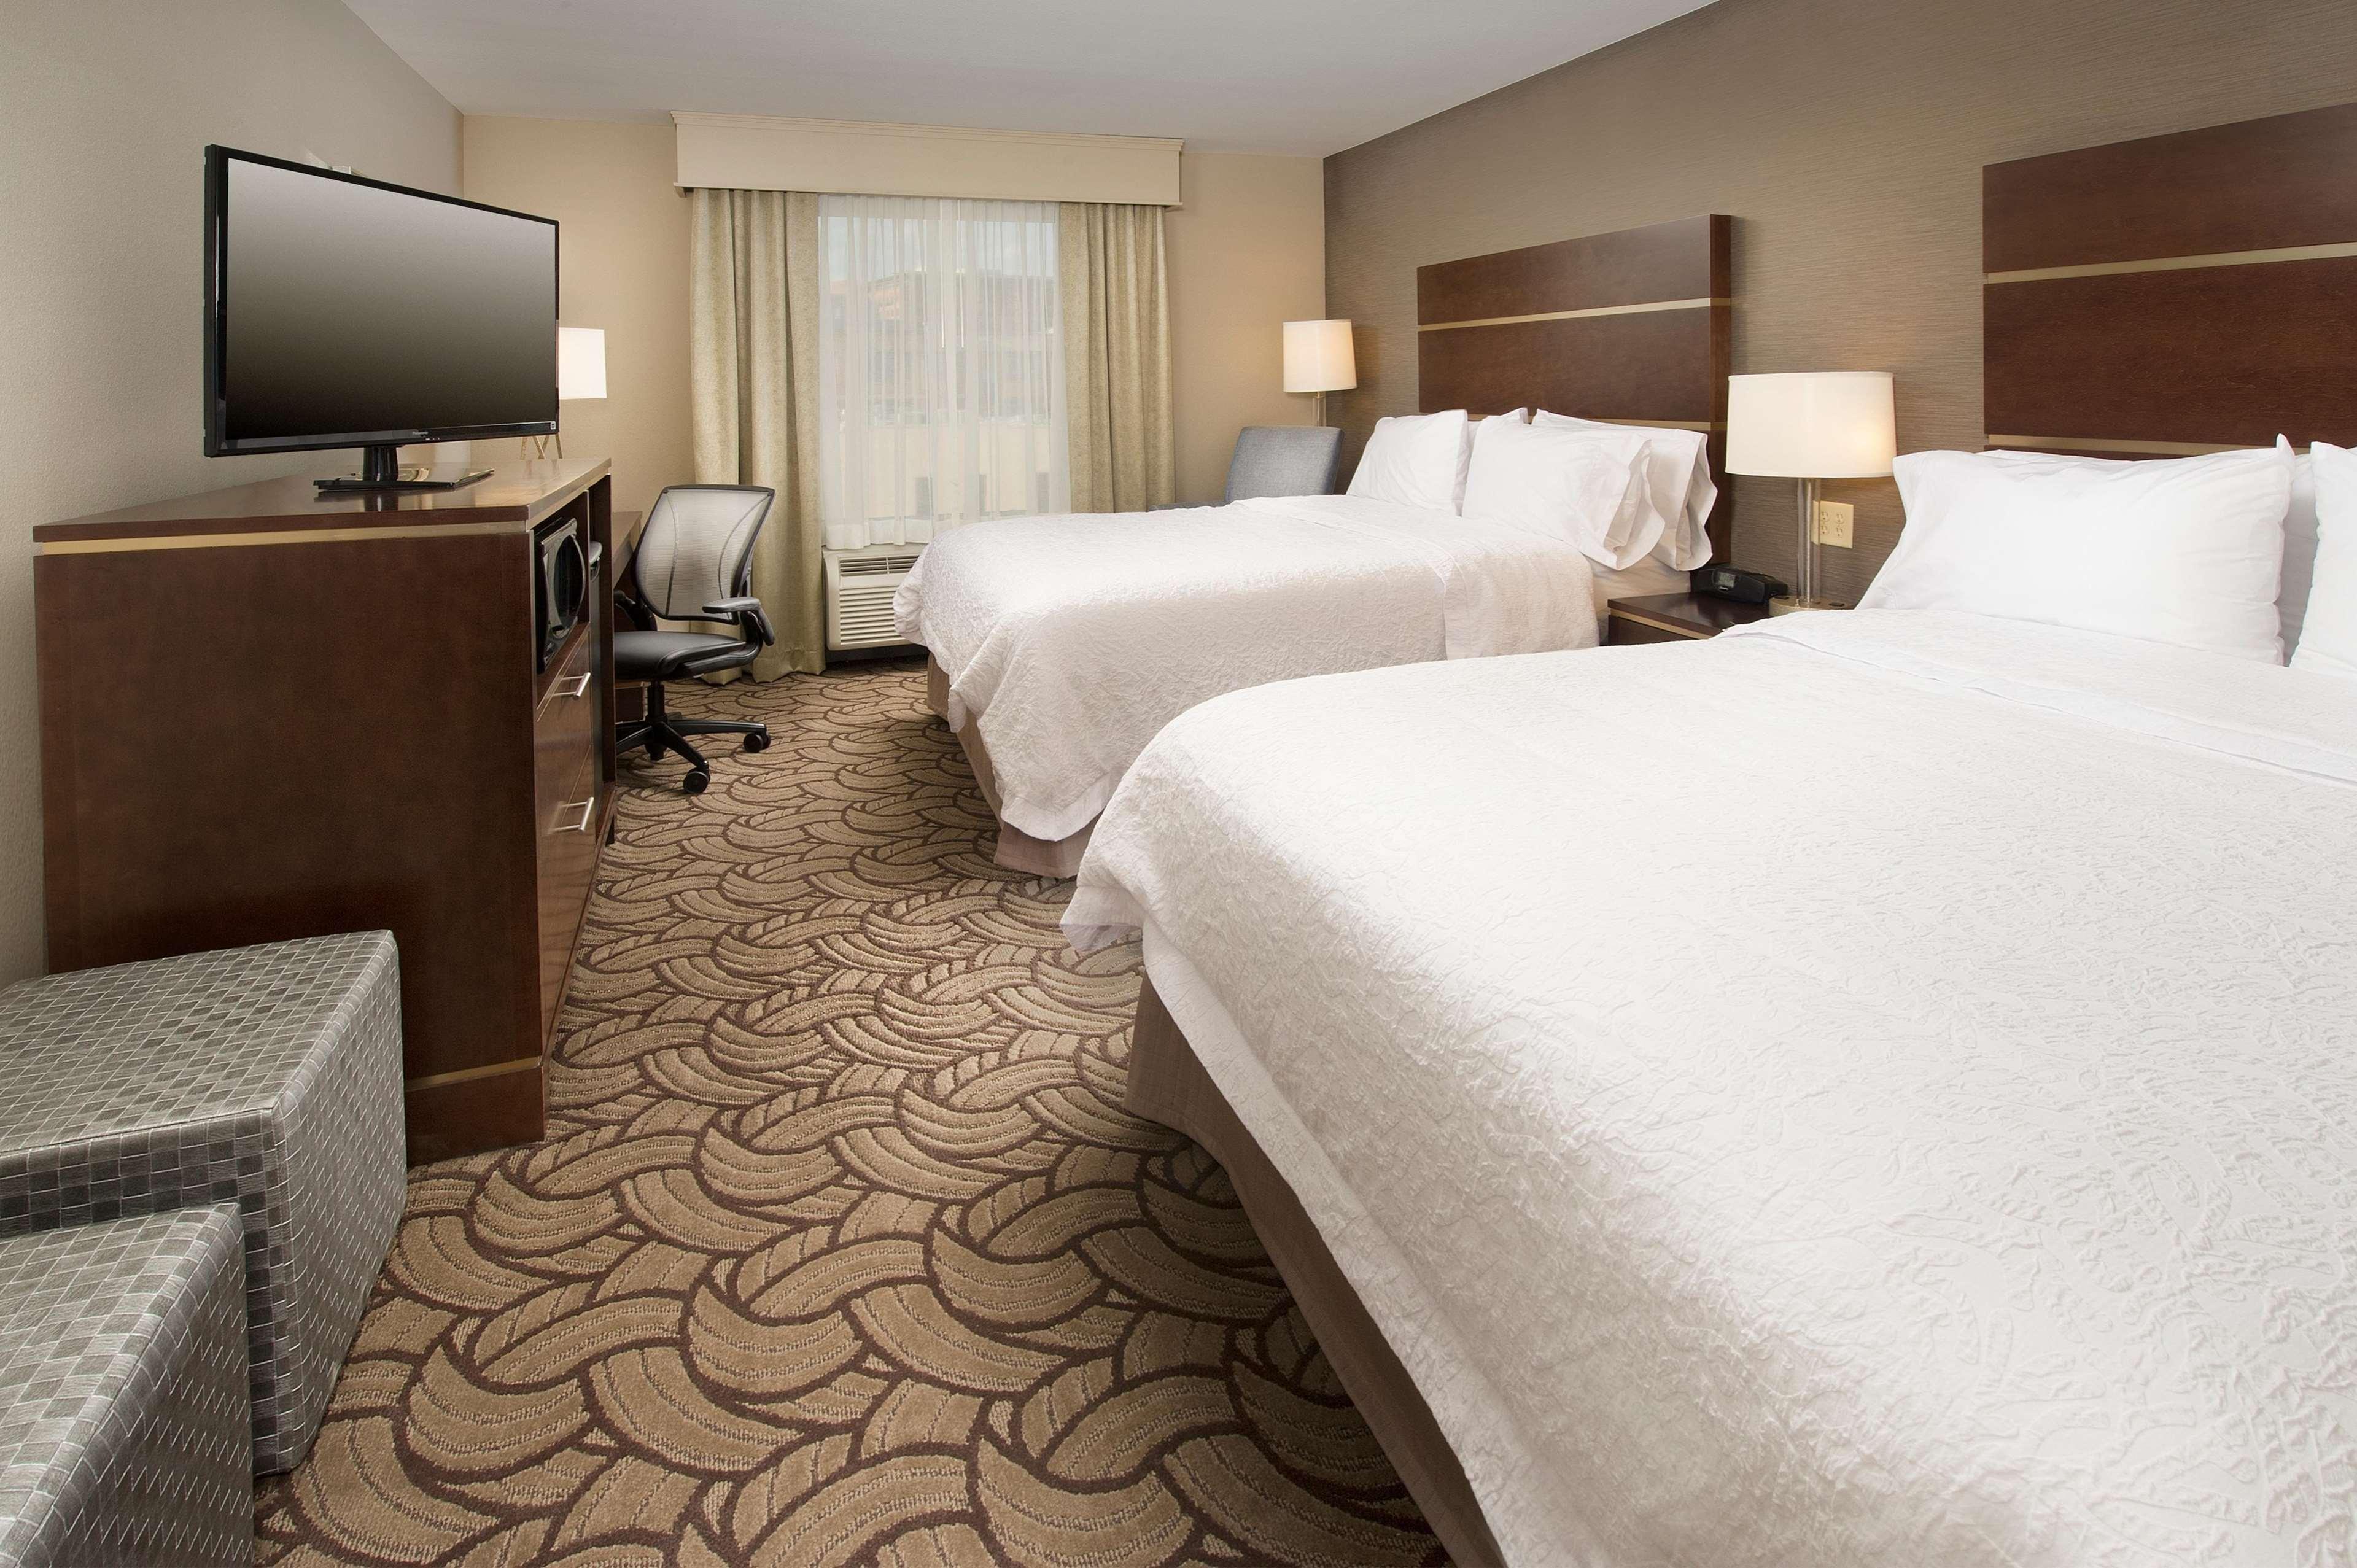 Hampton Inn & Suites San Antonio-Downtown/Market Square image 12